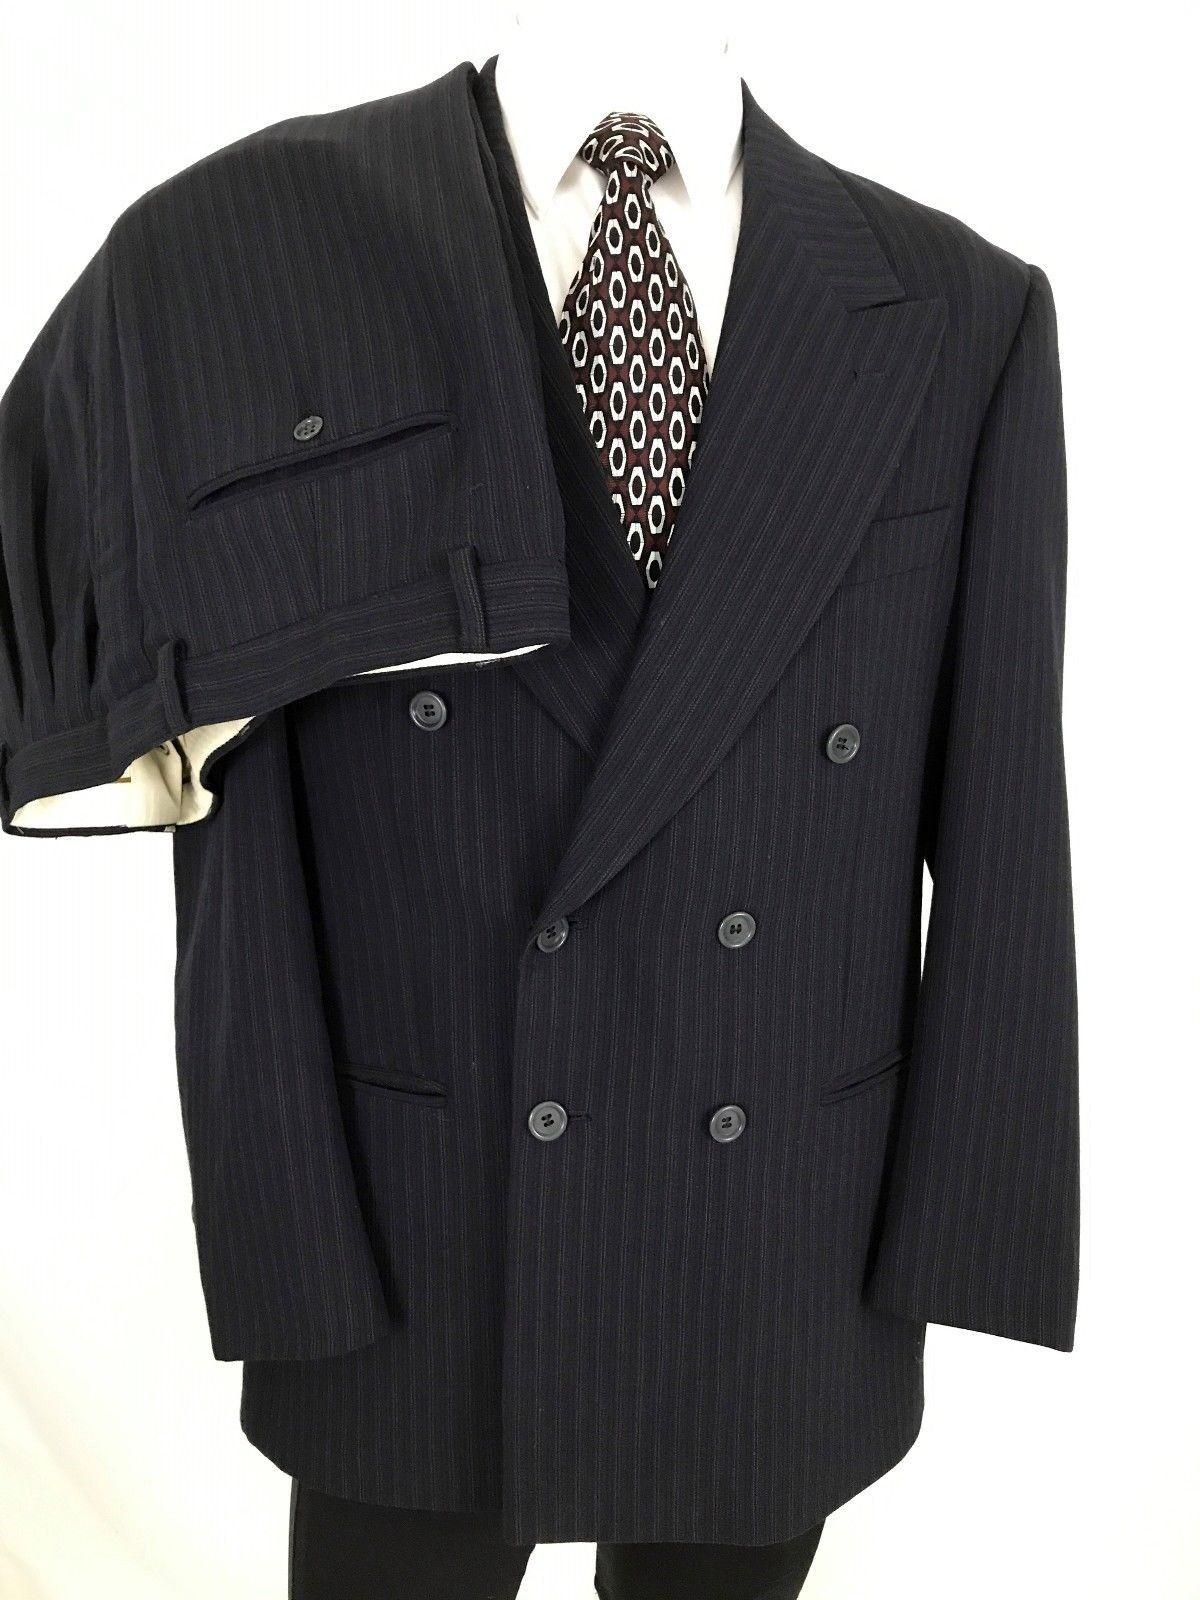 Zanetti Italian Double Breasted  Herren Suit 40R 32 x 30 Navy Blau Braun Pinstripe